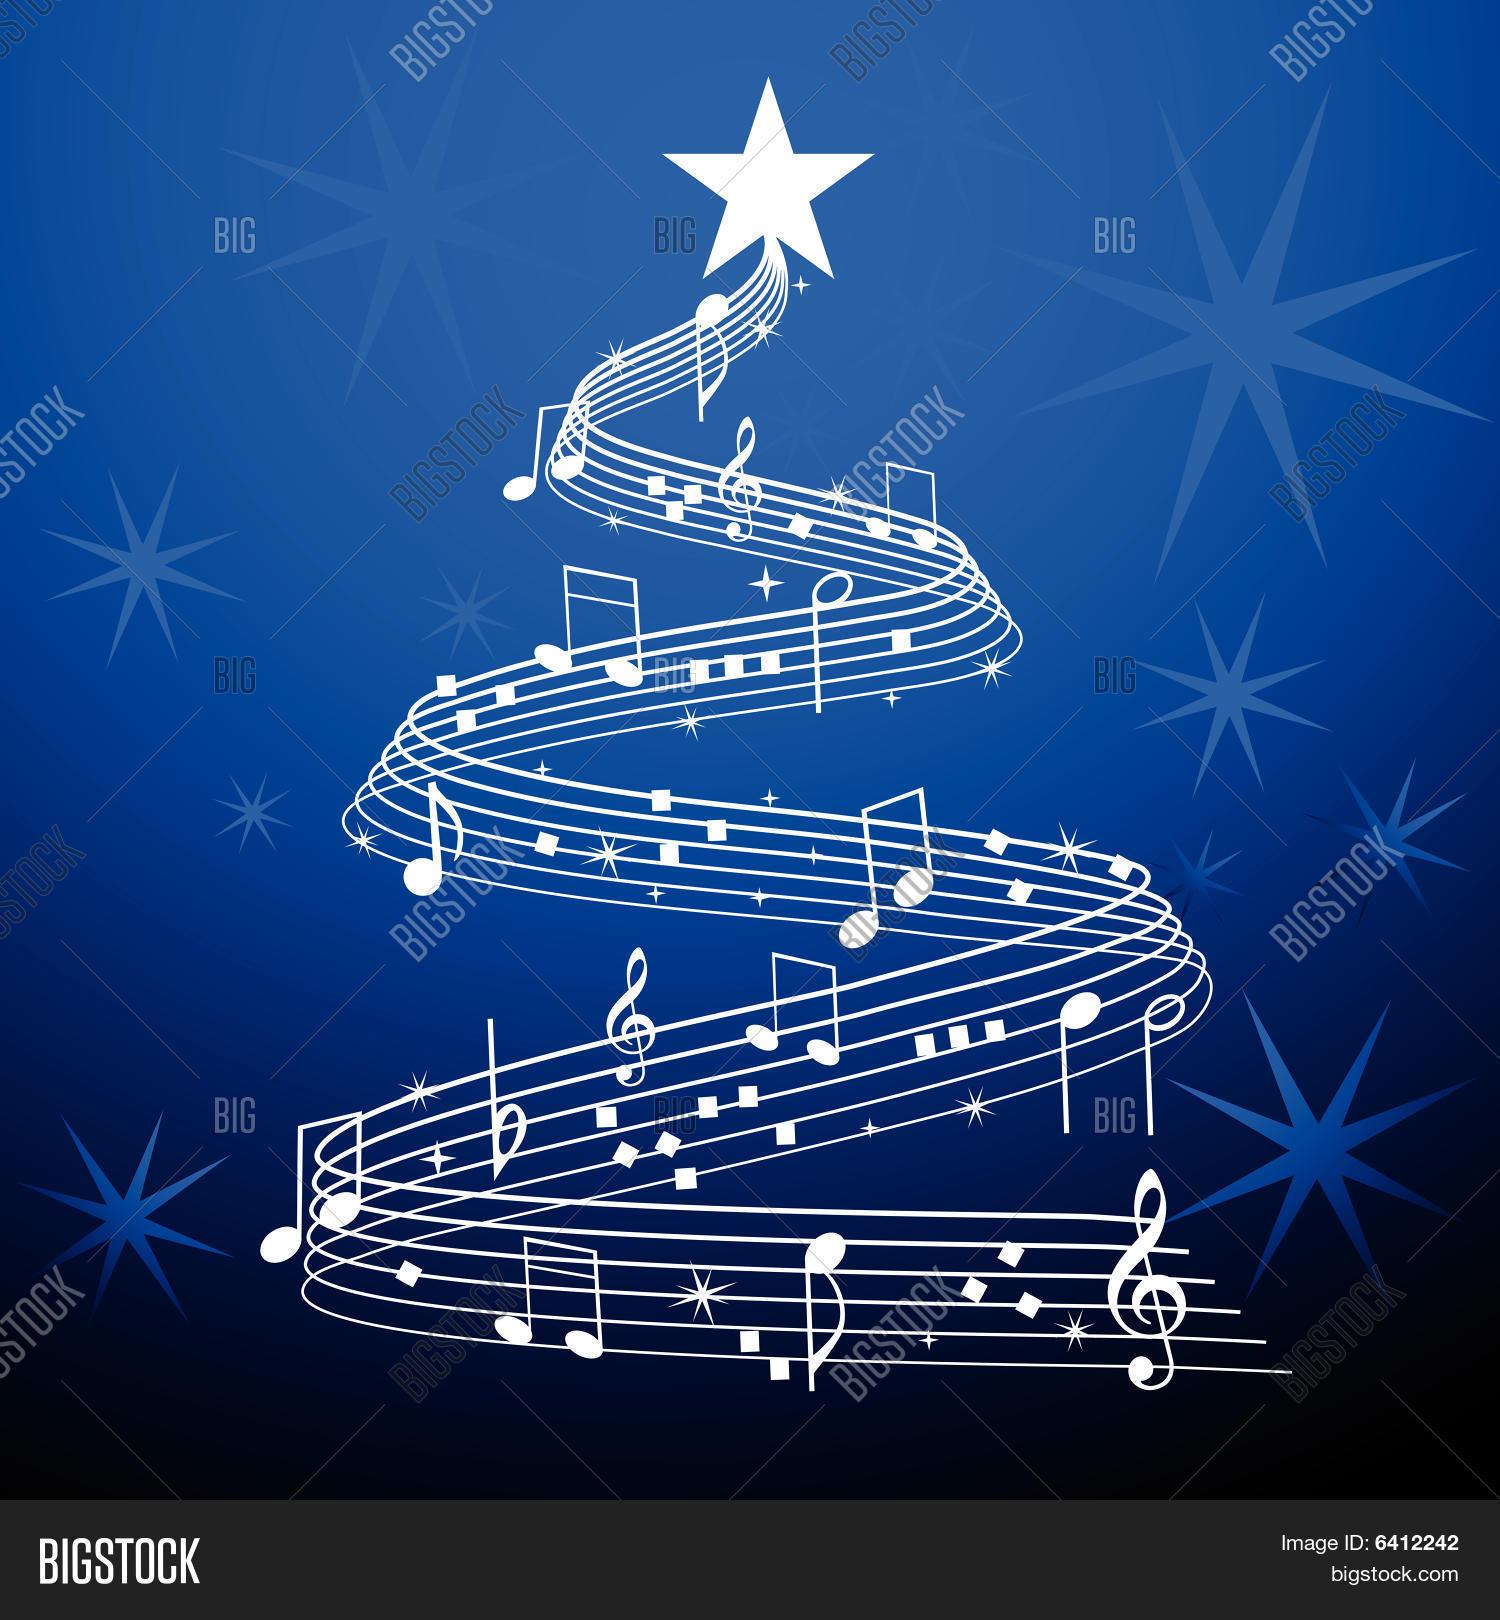 Popular Wallpaper Music Christmas - 6412242  Pictures_65117.jpg